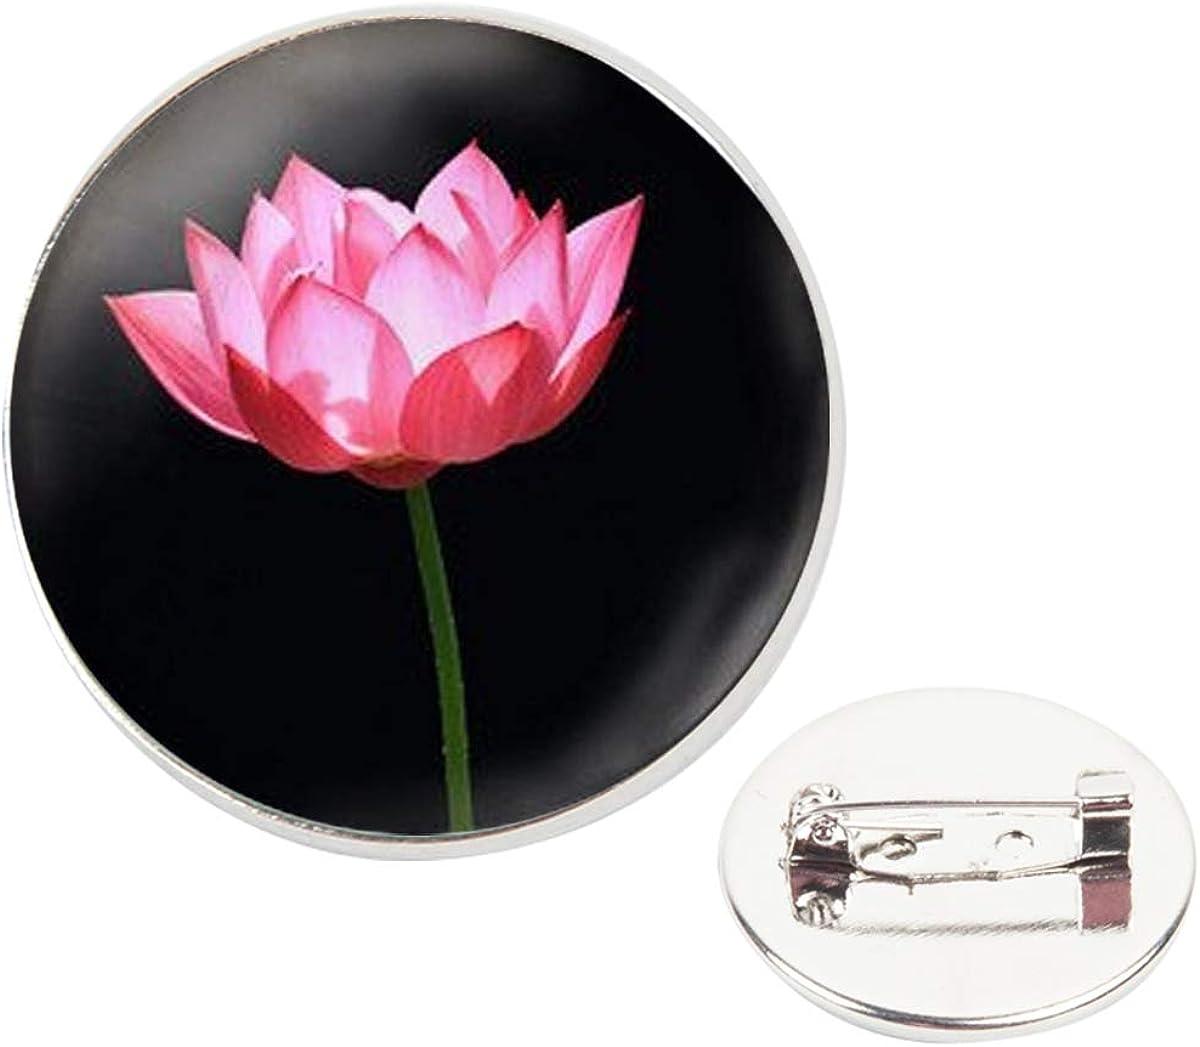 Pinback Buttons Badges Pins A Black Lotus Art Lapel Pin Brooch Clip Trendy Accessory Jacket T-Shirt Bag Hat Shoe